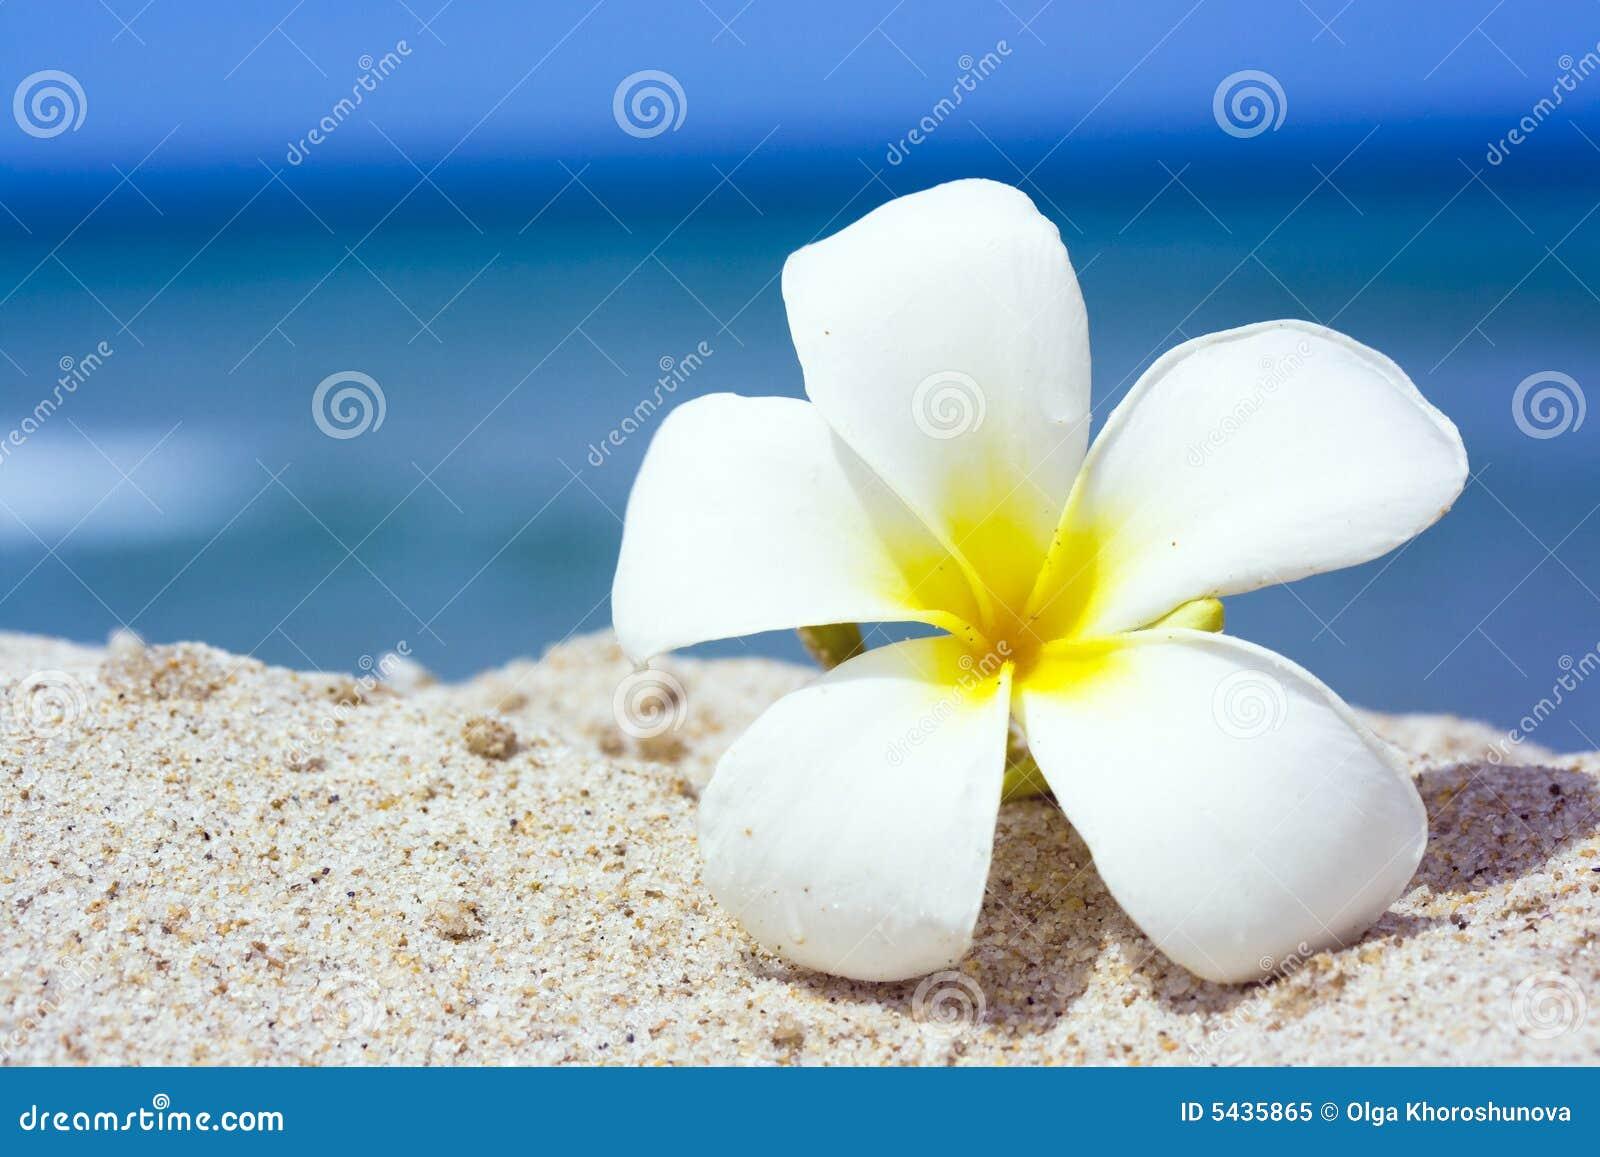 Frangipani spa flowers stock photo image 14654190 - Tropical Flower Royalty Free Stock Photo